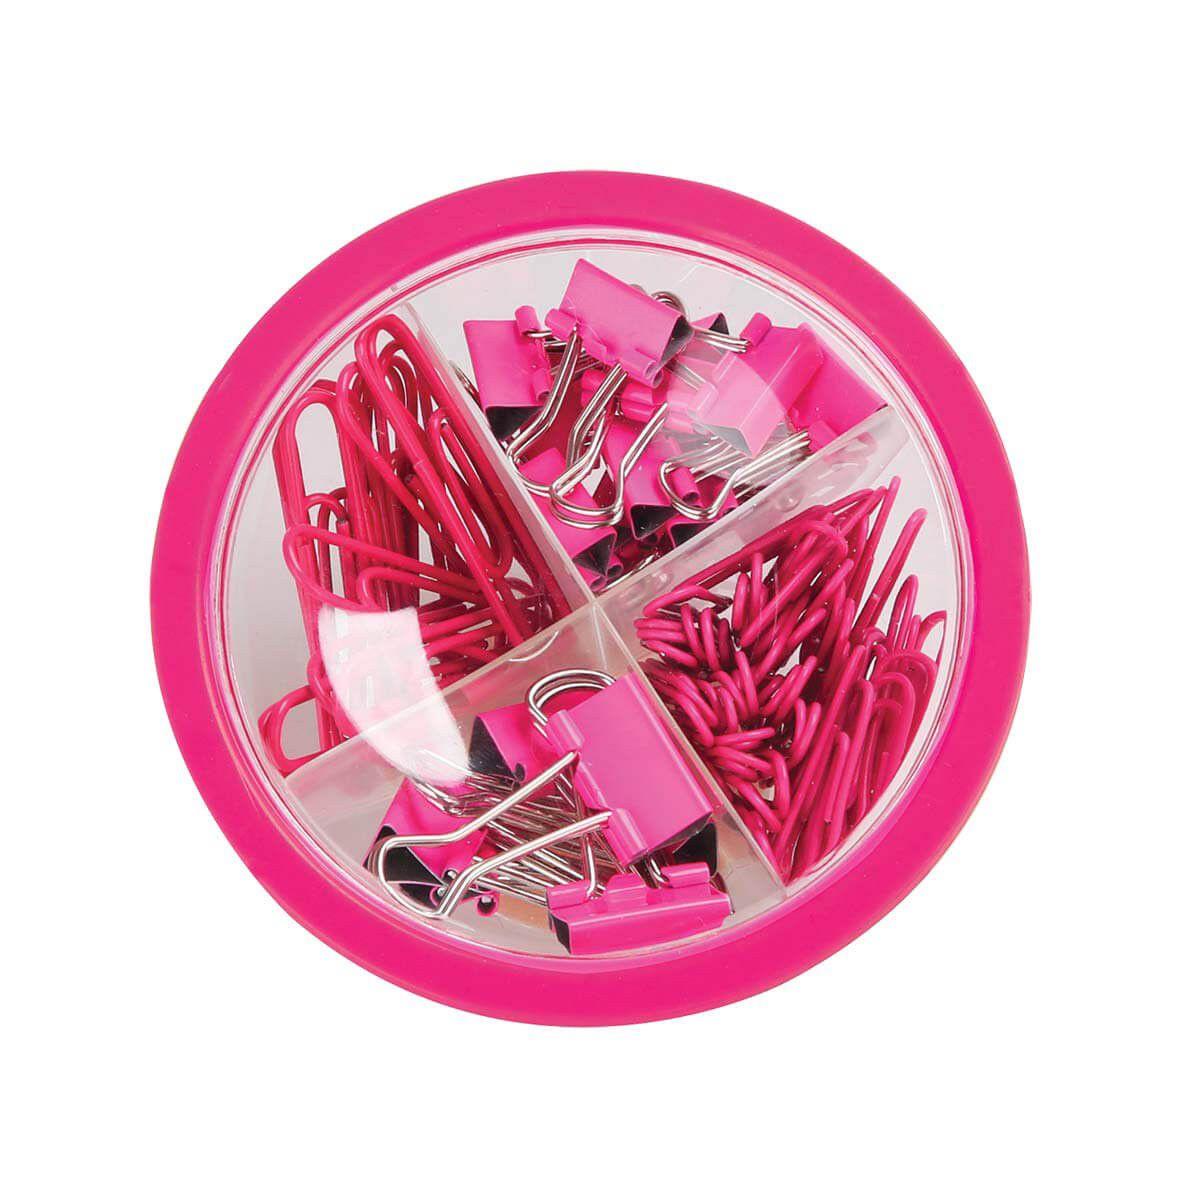 Kit clips e binder Pink Tilibra